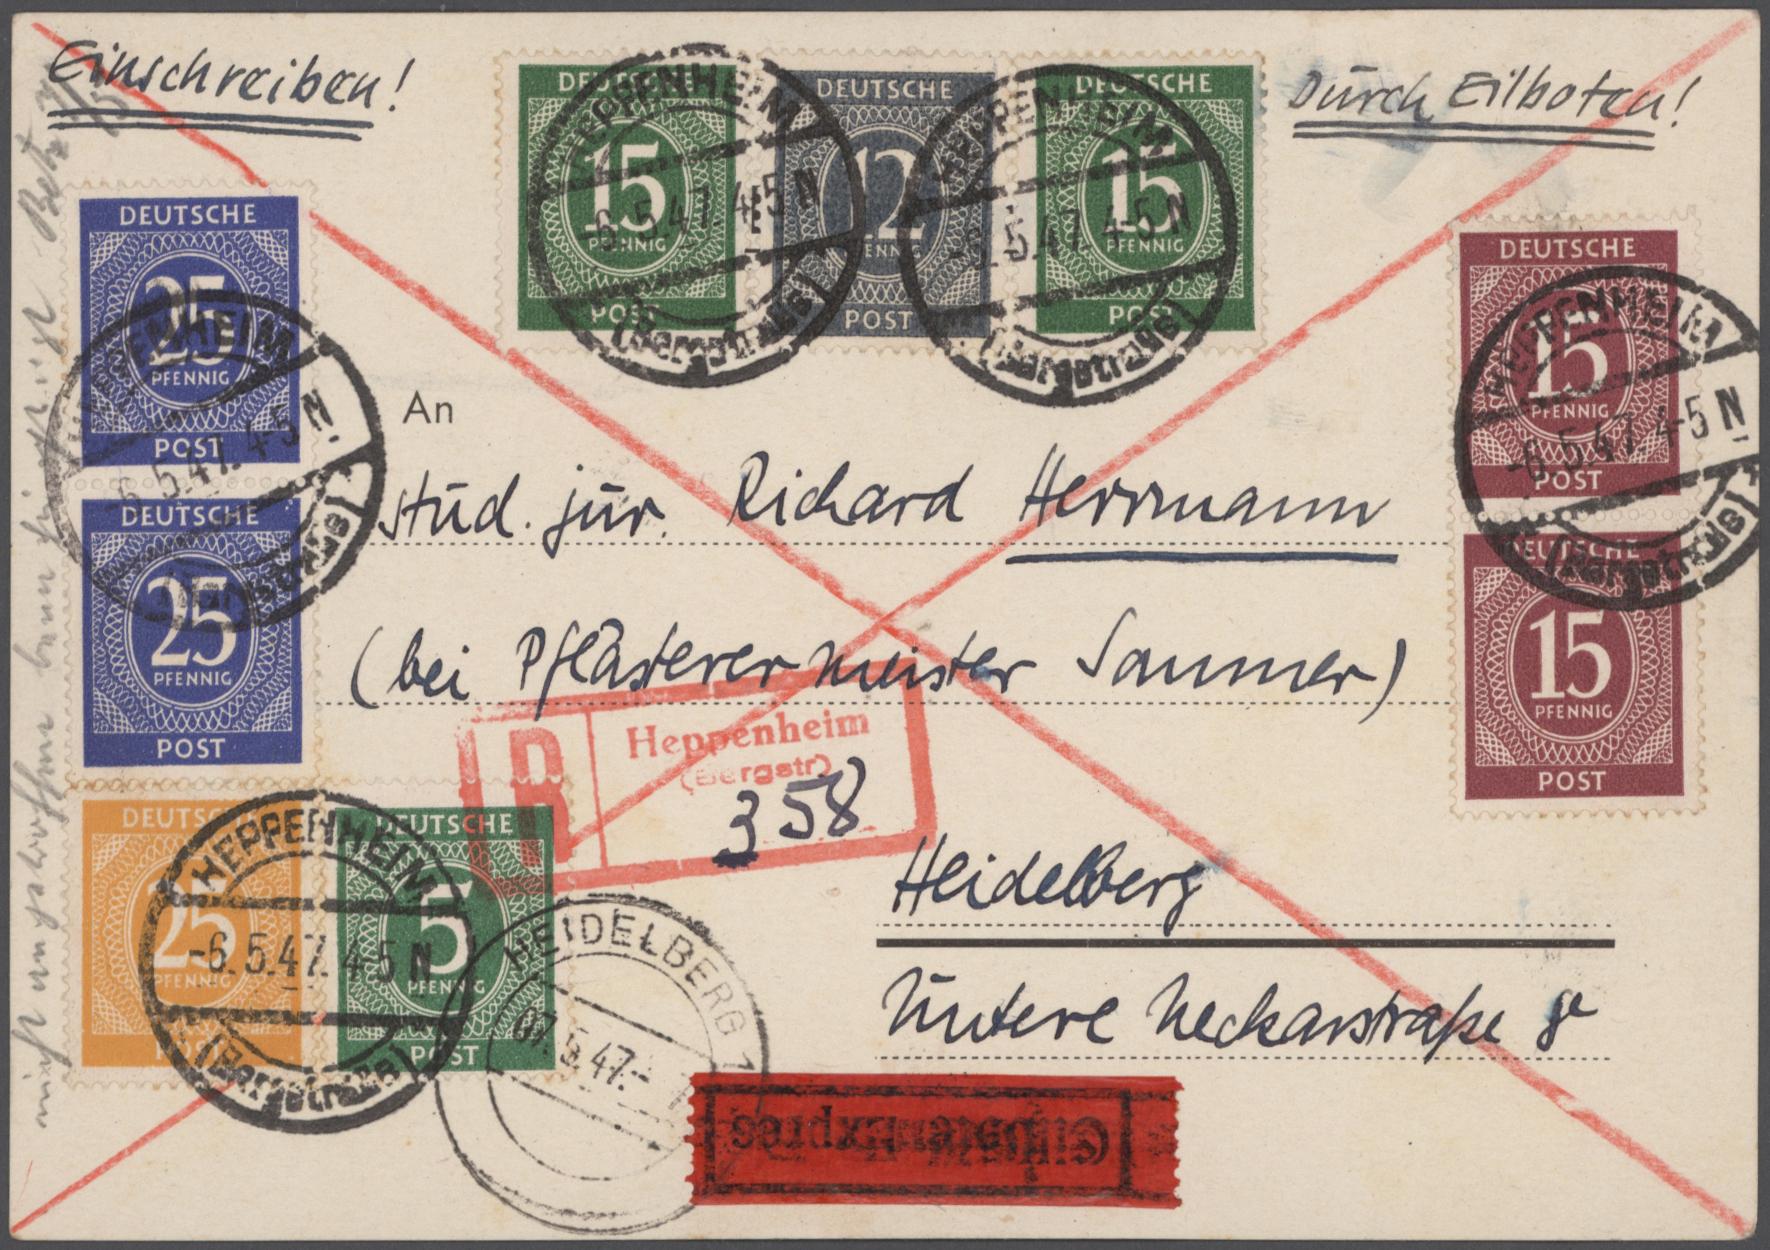 Lot 26218 - nachlässe  -  Auktionshaus Christoph Gärtner GmbH & Co. KG Sale #46 Gollcetions Germany - including the suplement